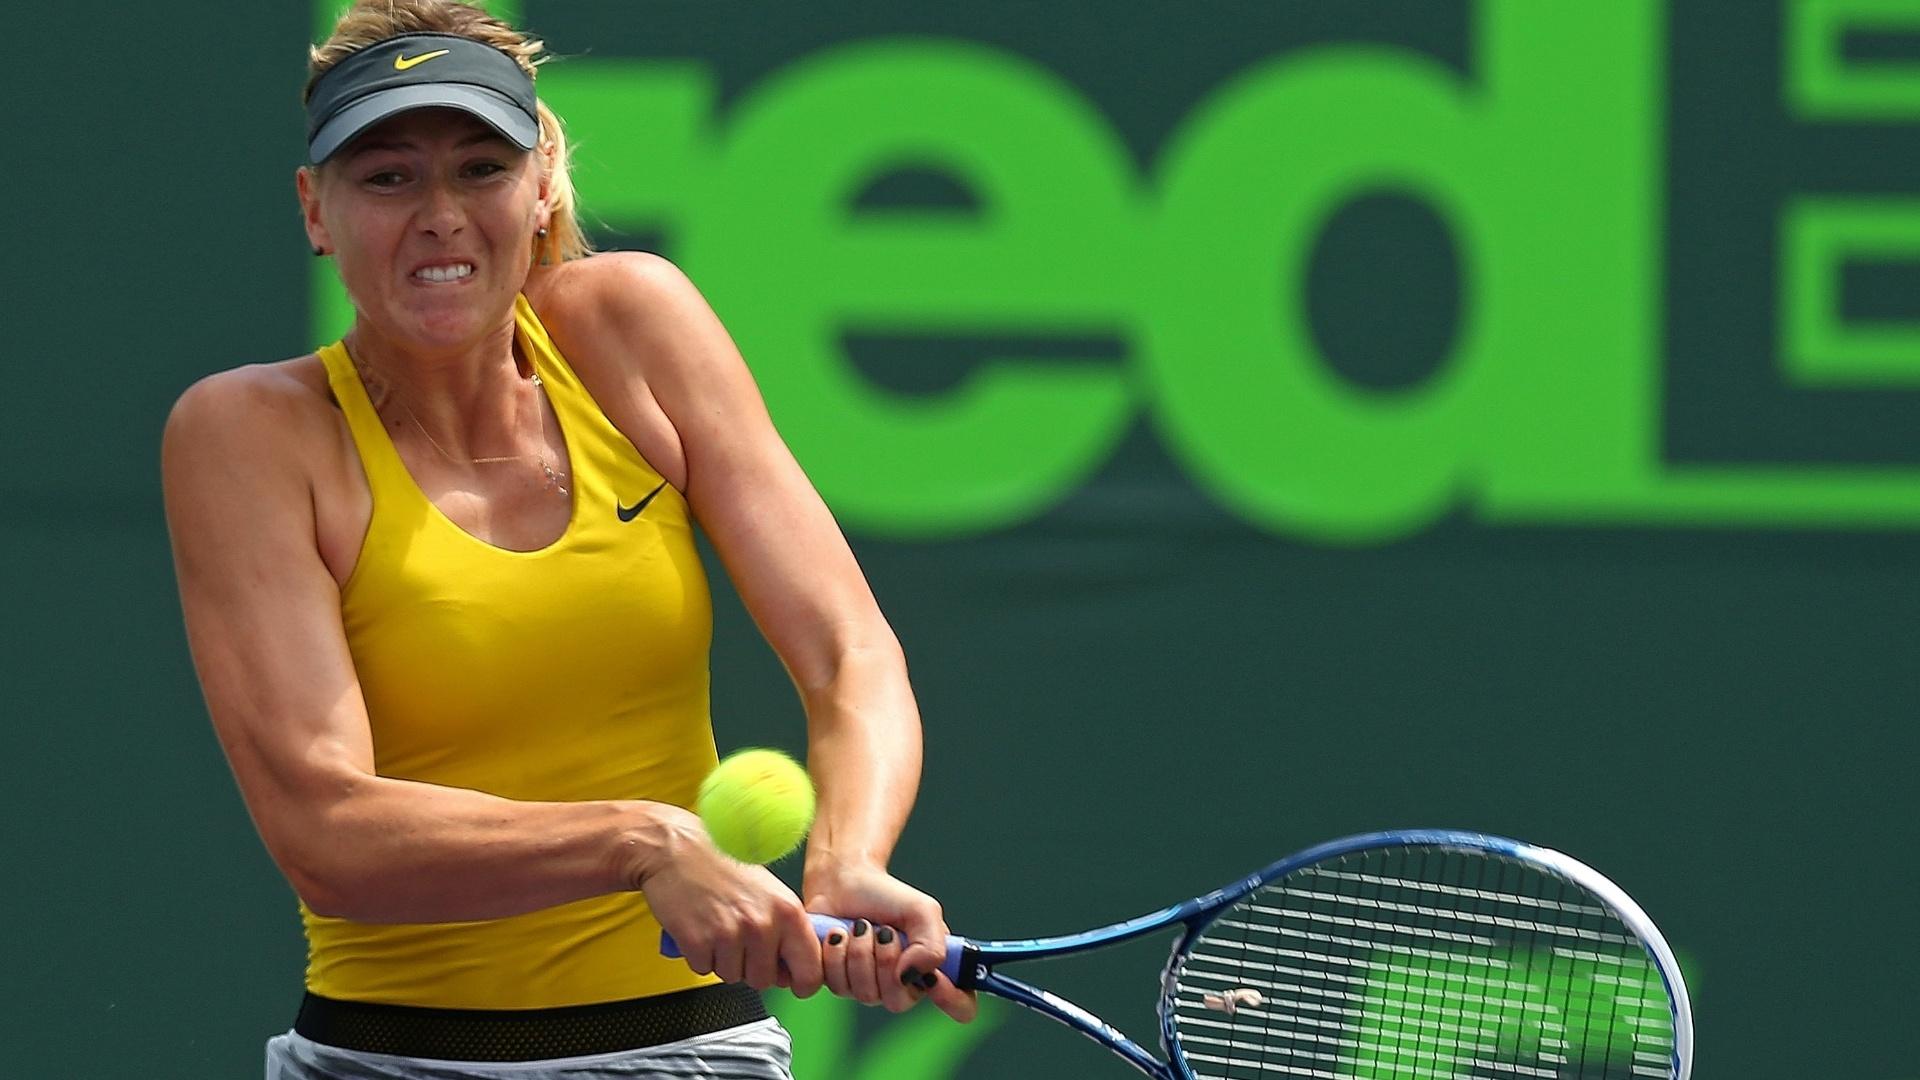 27.mar.2014 - Maria Sharapova se esforça para rebater bola de Serena Williams no Premier de Miami